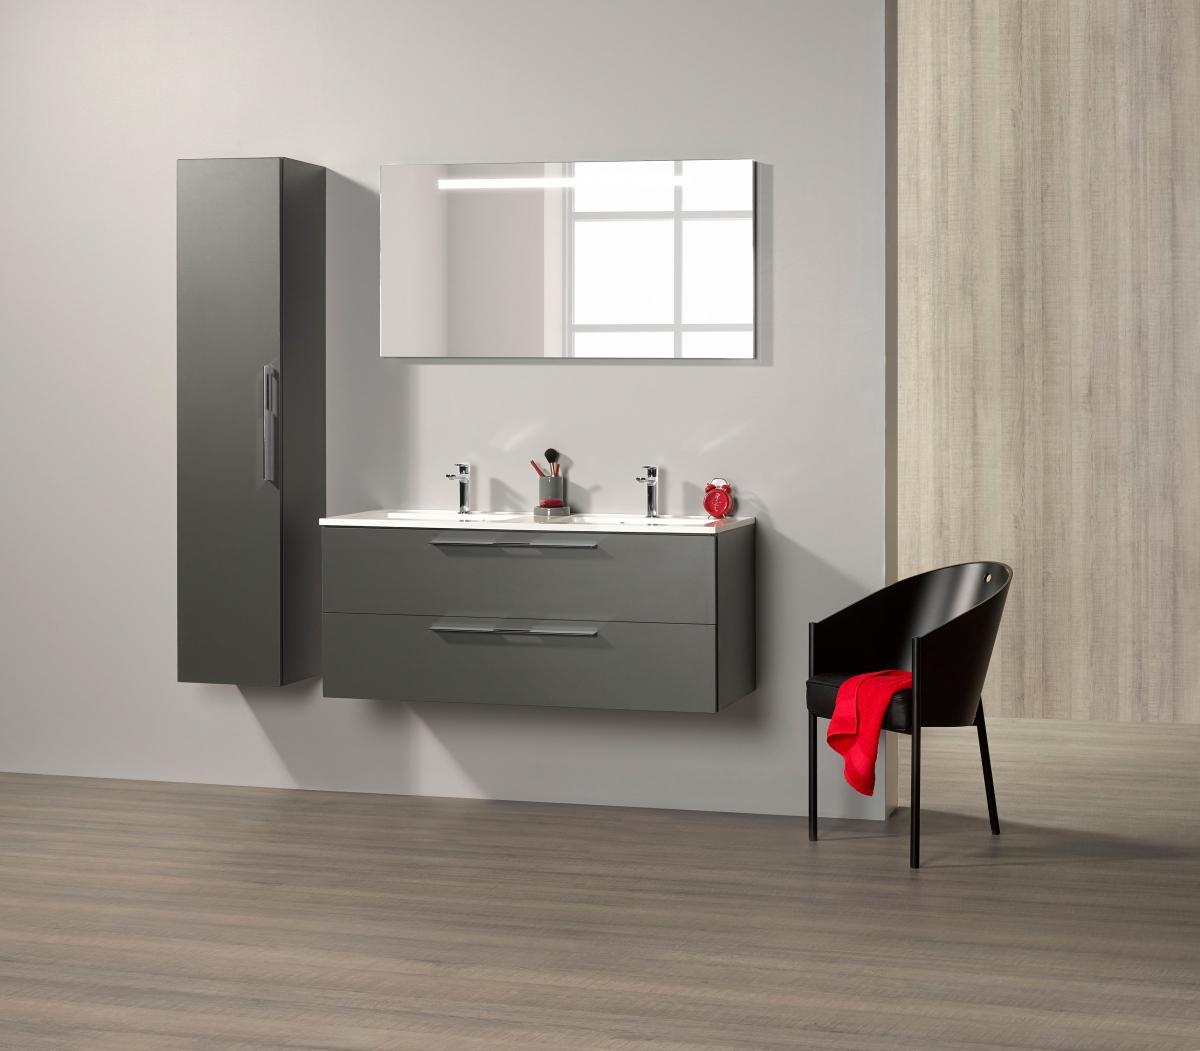 Meubles de salle de bains vara zenid induscabel salle - Meuble de cuisine dans salle de bain ...